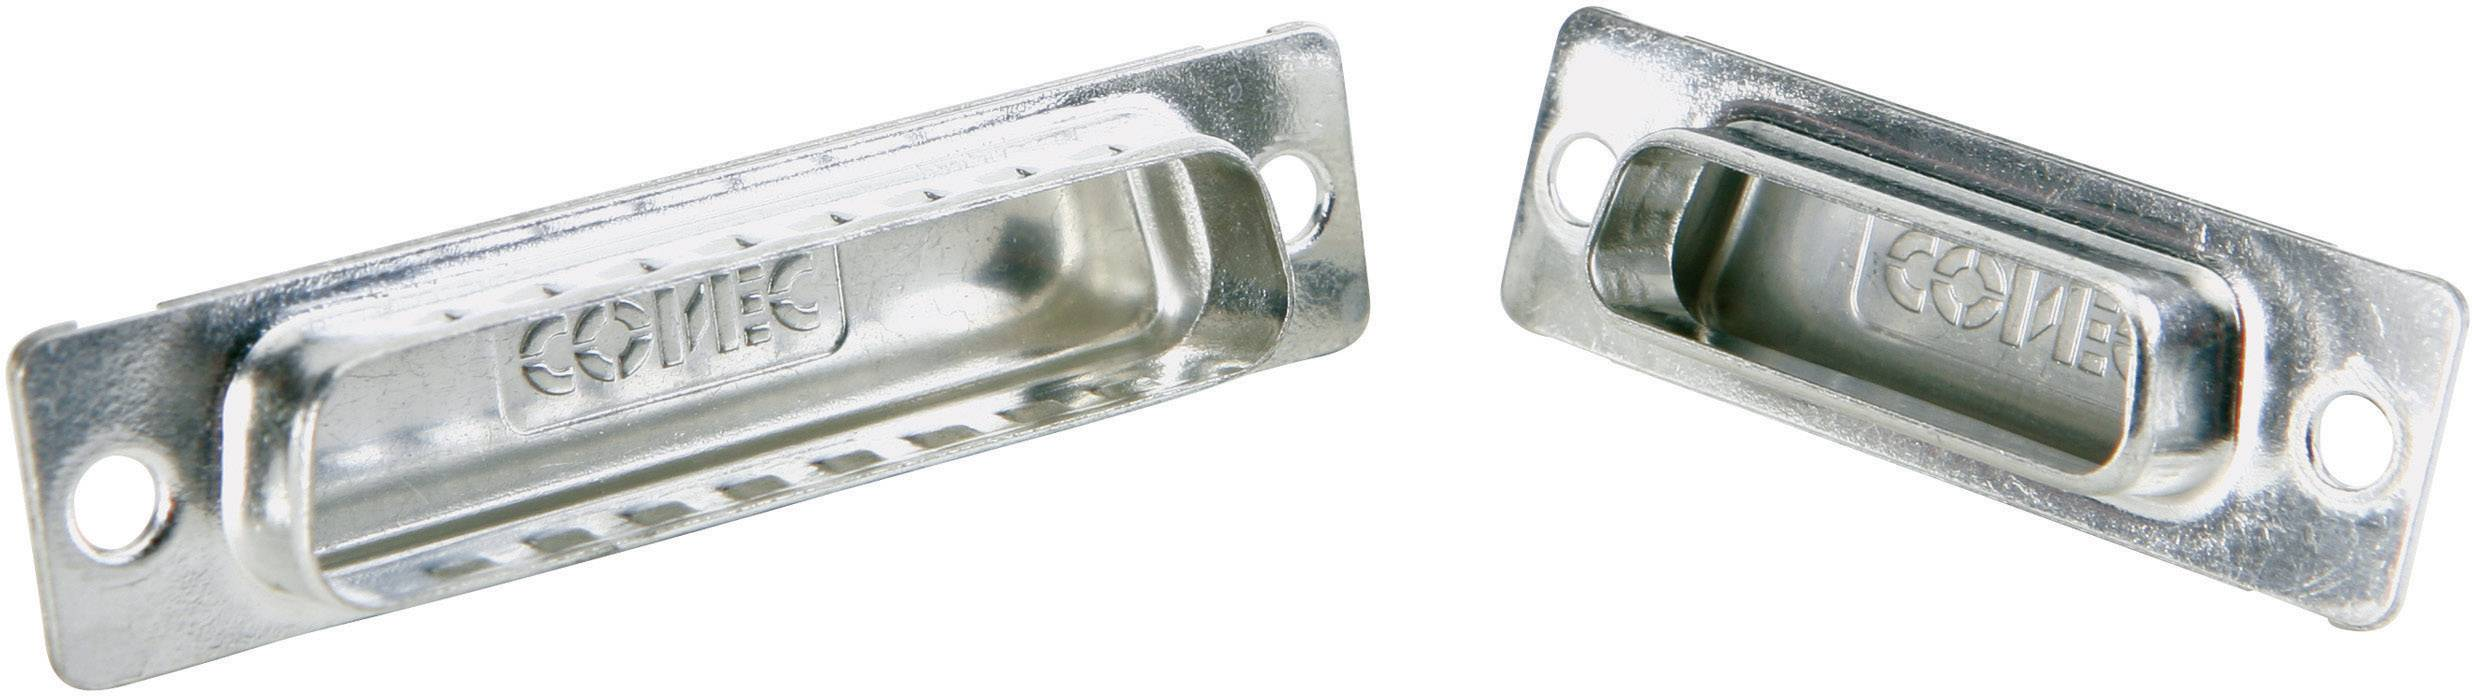 Záslepka D-SUB konektoru Conec 165X12979X, strieborná, 1 ks